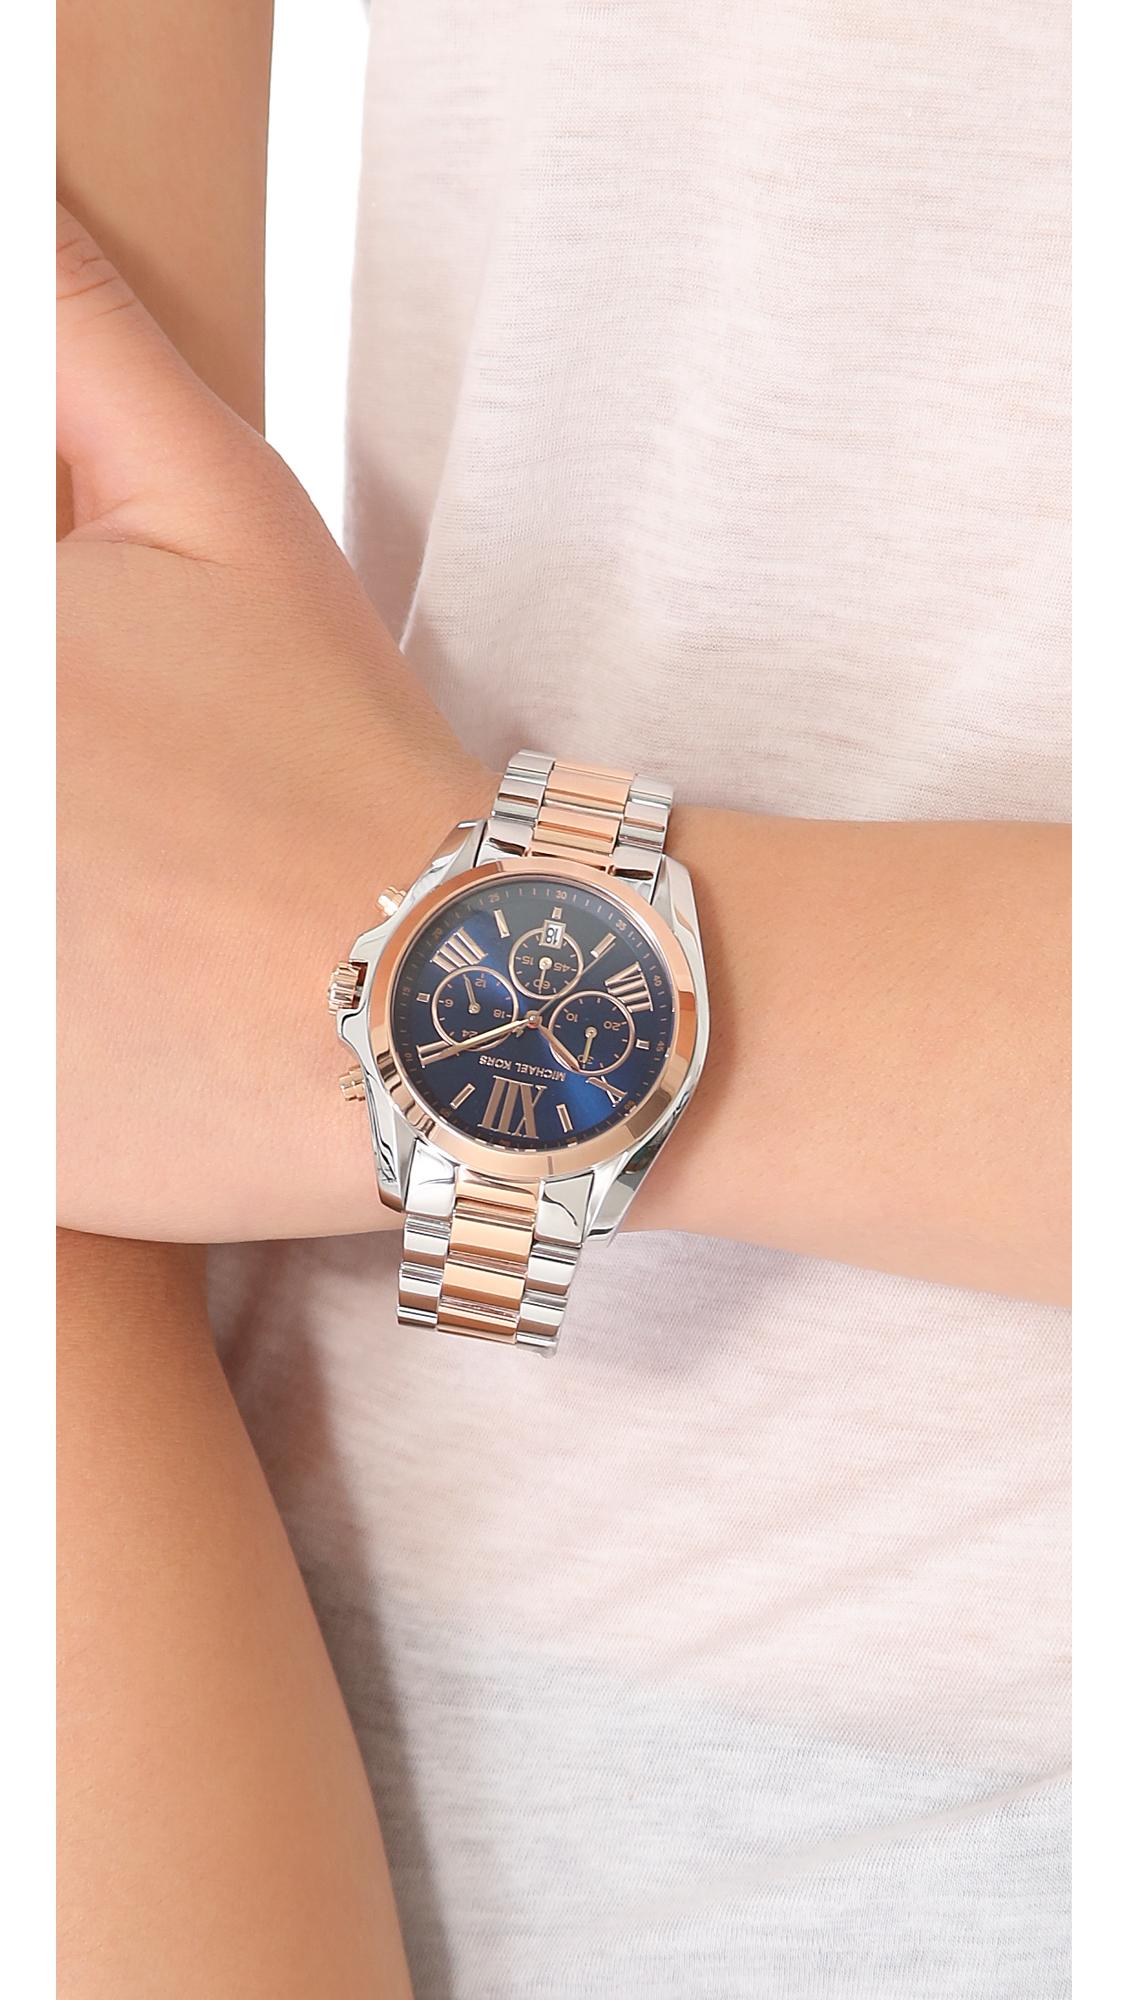 88e1af2c49ff Michael Kors Bradshaw Two Tone Watch in Metallic - Lyst